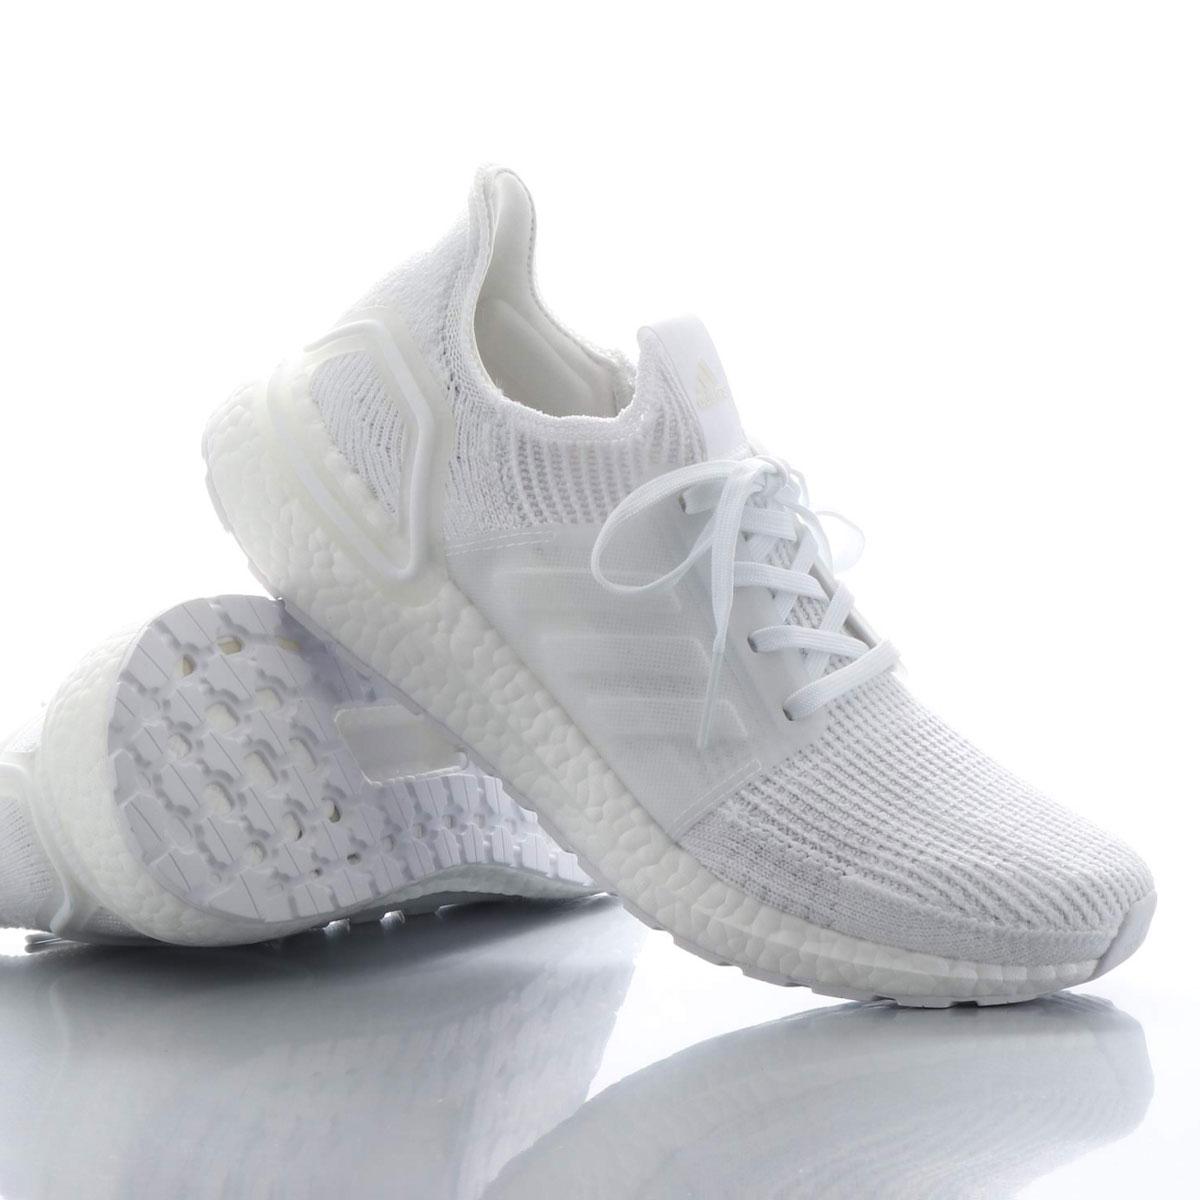 adidas UltraBOOST 19(アディダス ウルトラブースト 19)RUNNING WHITE/RUNNING WHITE/CORE BLACK【メンズ スニーカー】19SU-I